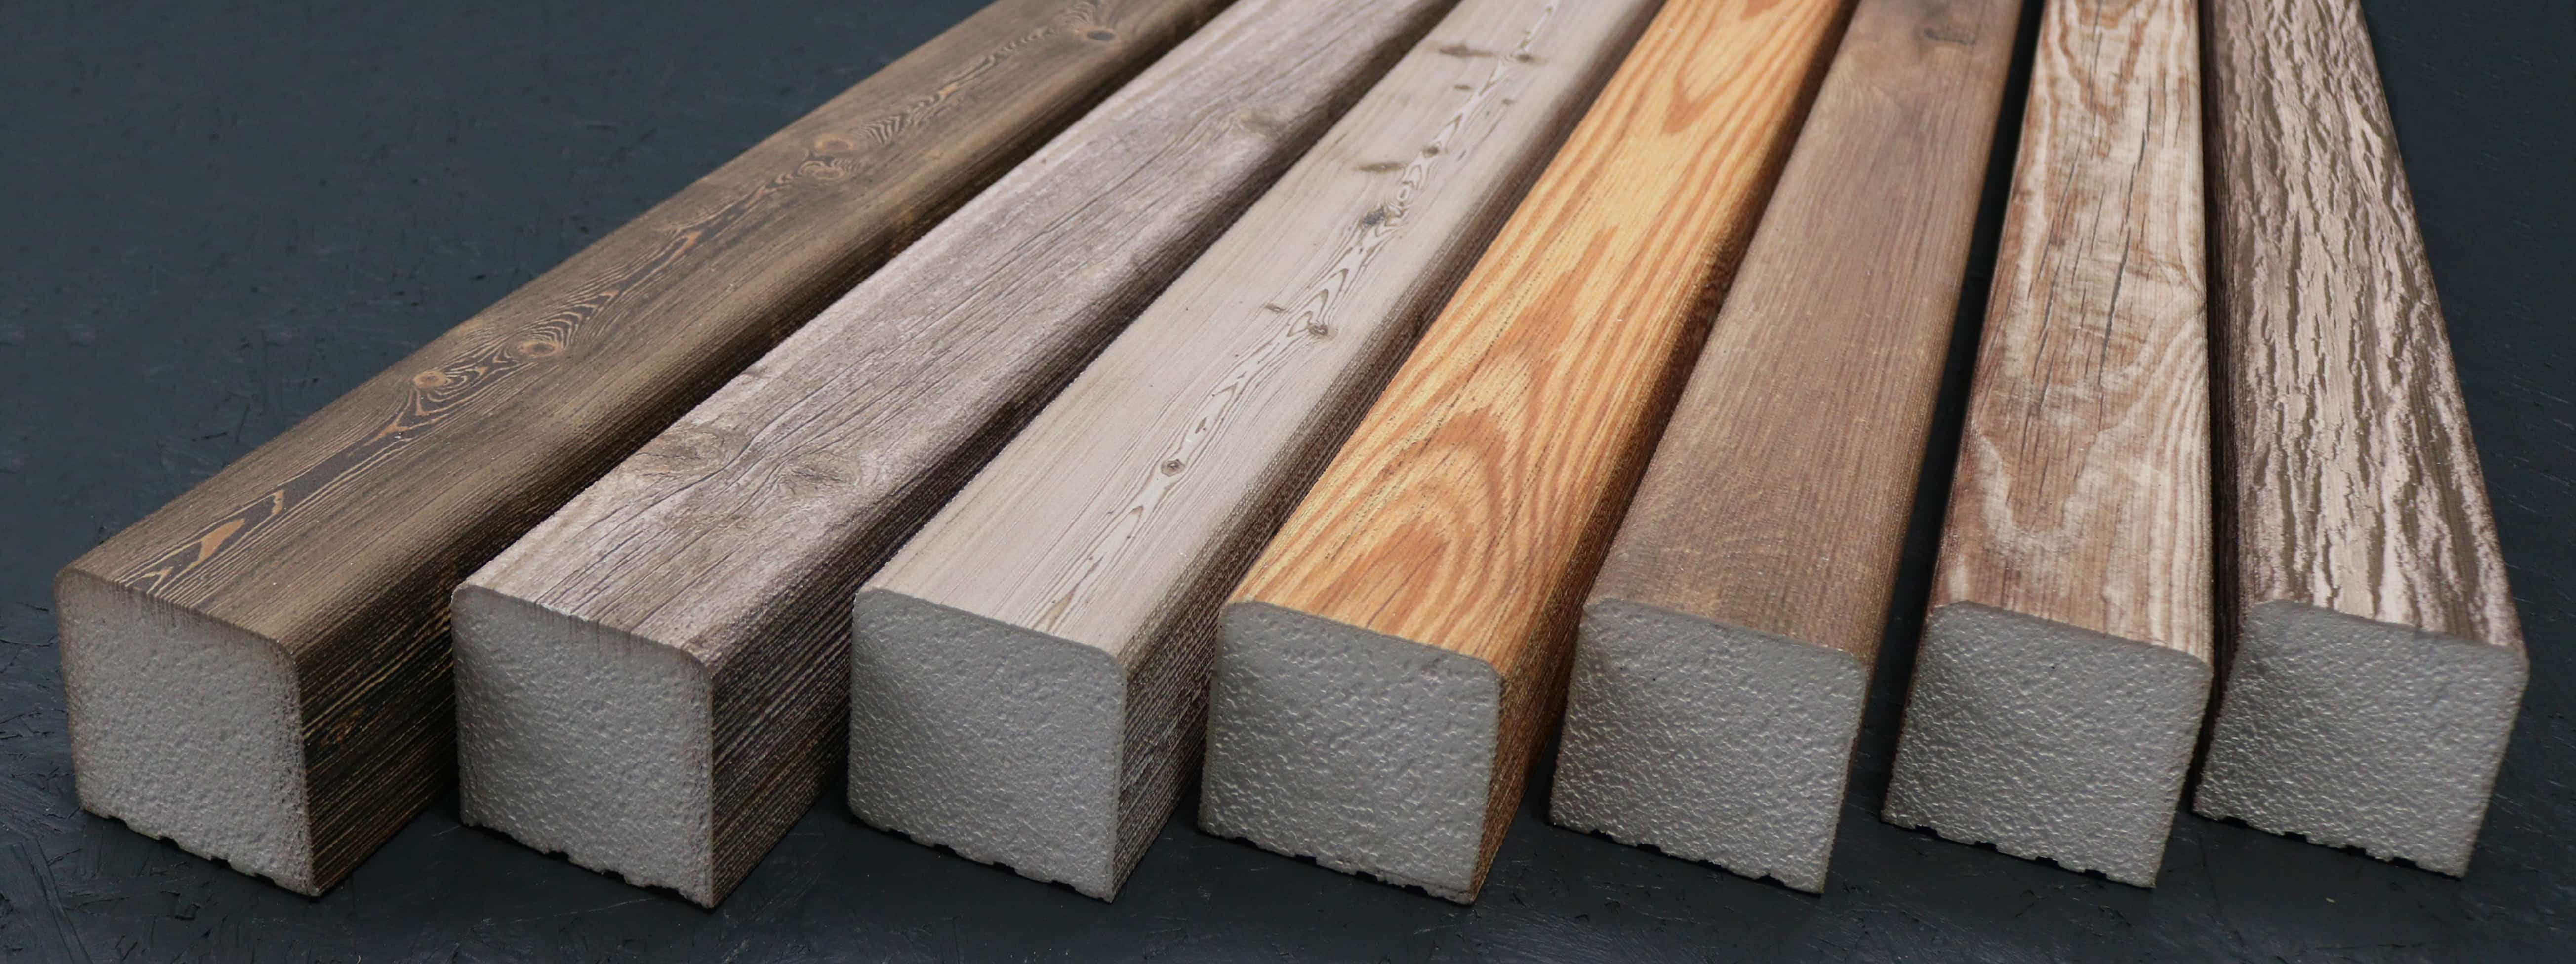 Kantholz/Holzpfosten Styropor London 9cm x 9cm